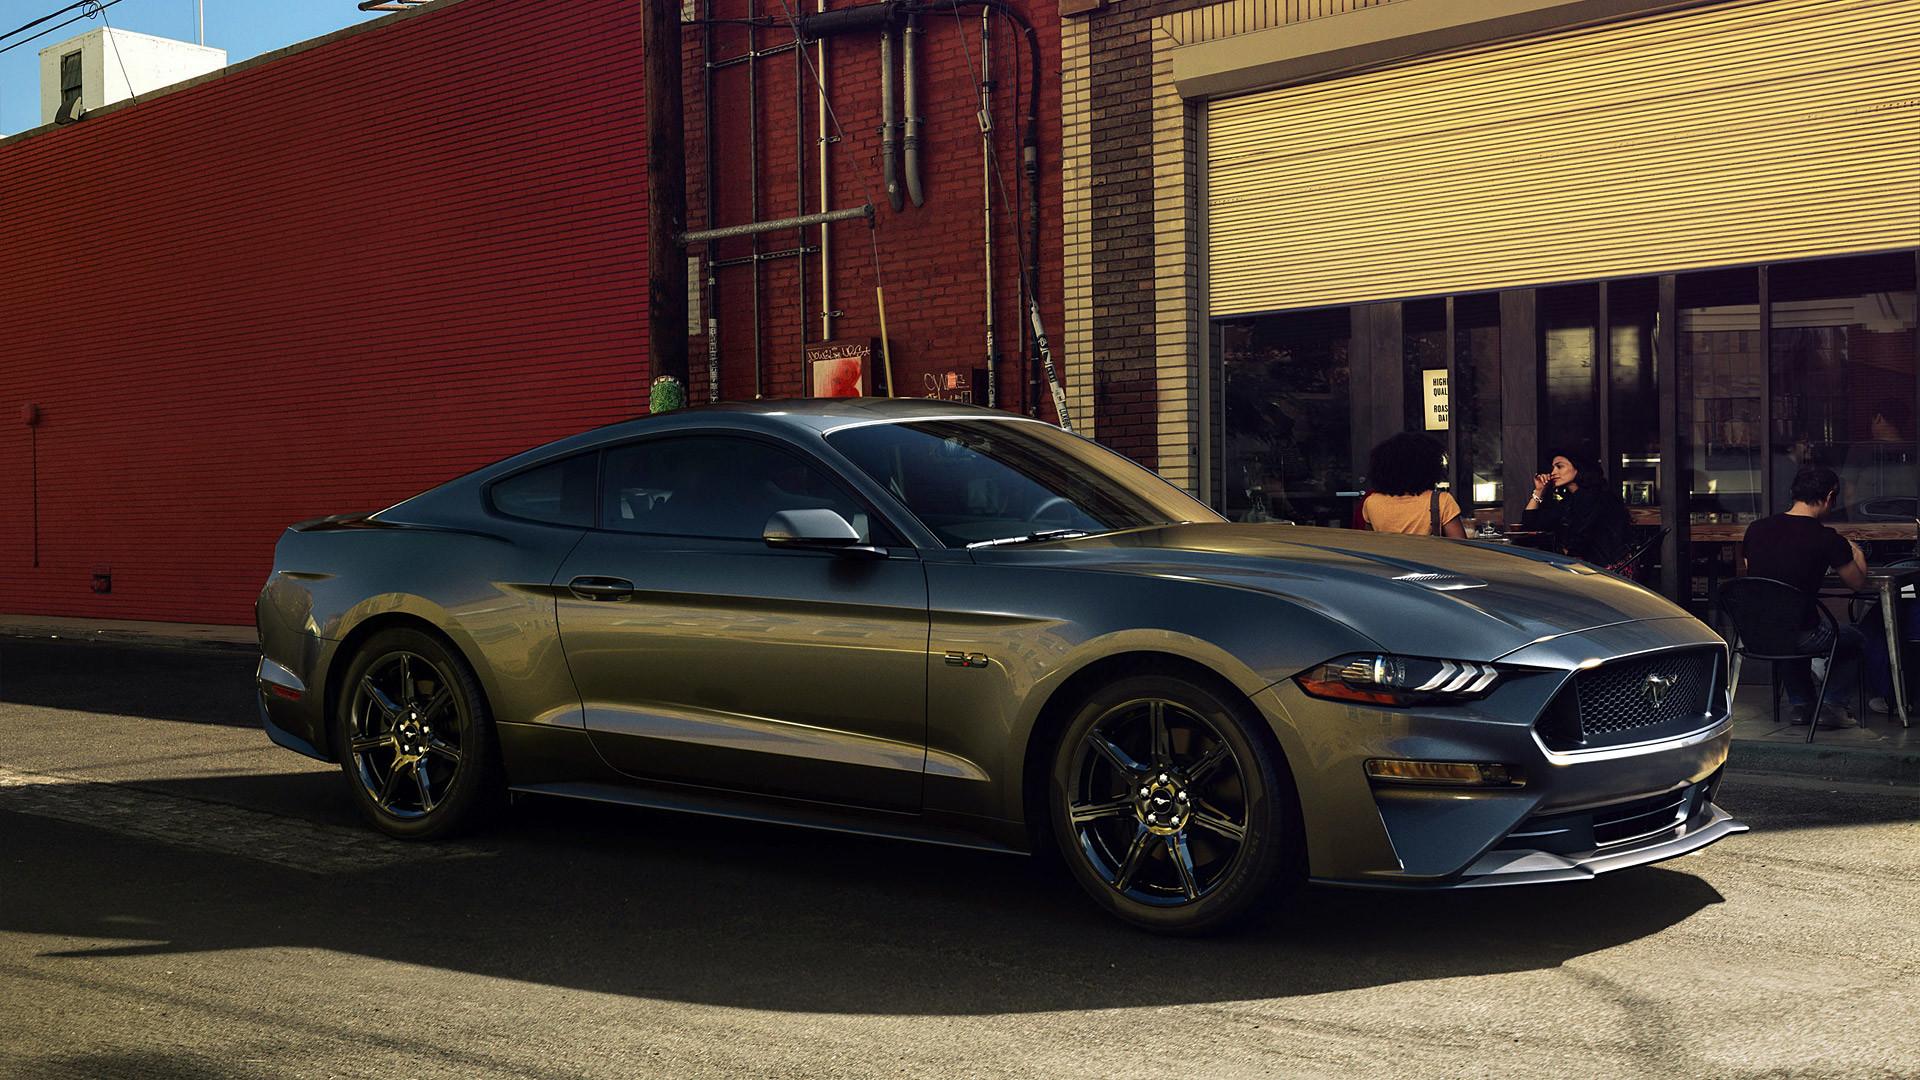 2018 Mustang Wallpaper (57+ images)